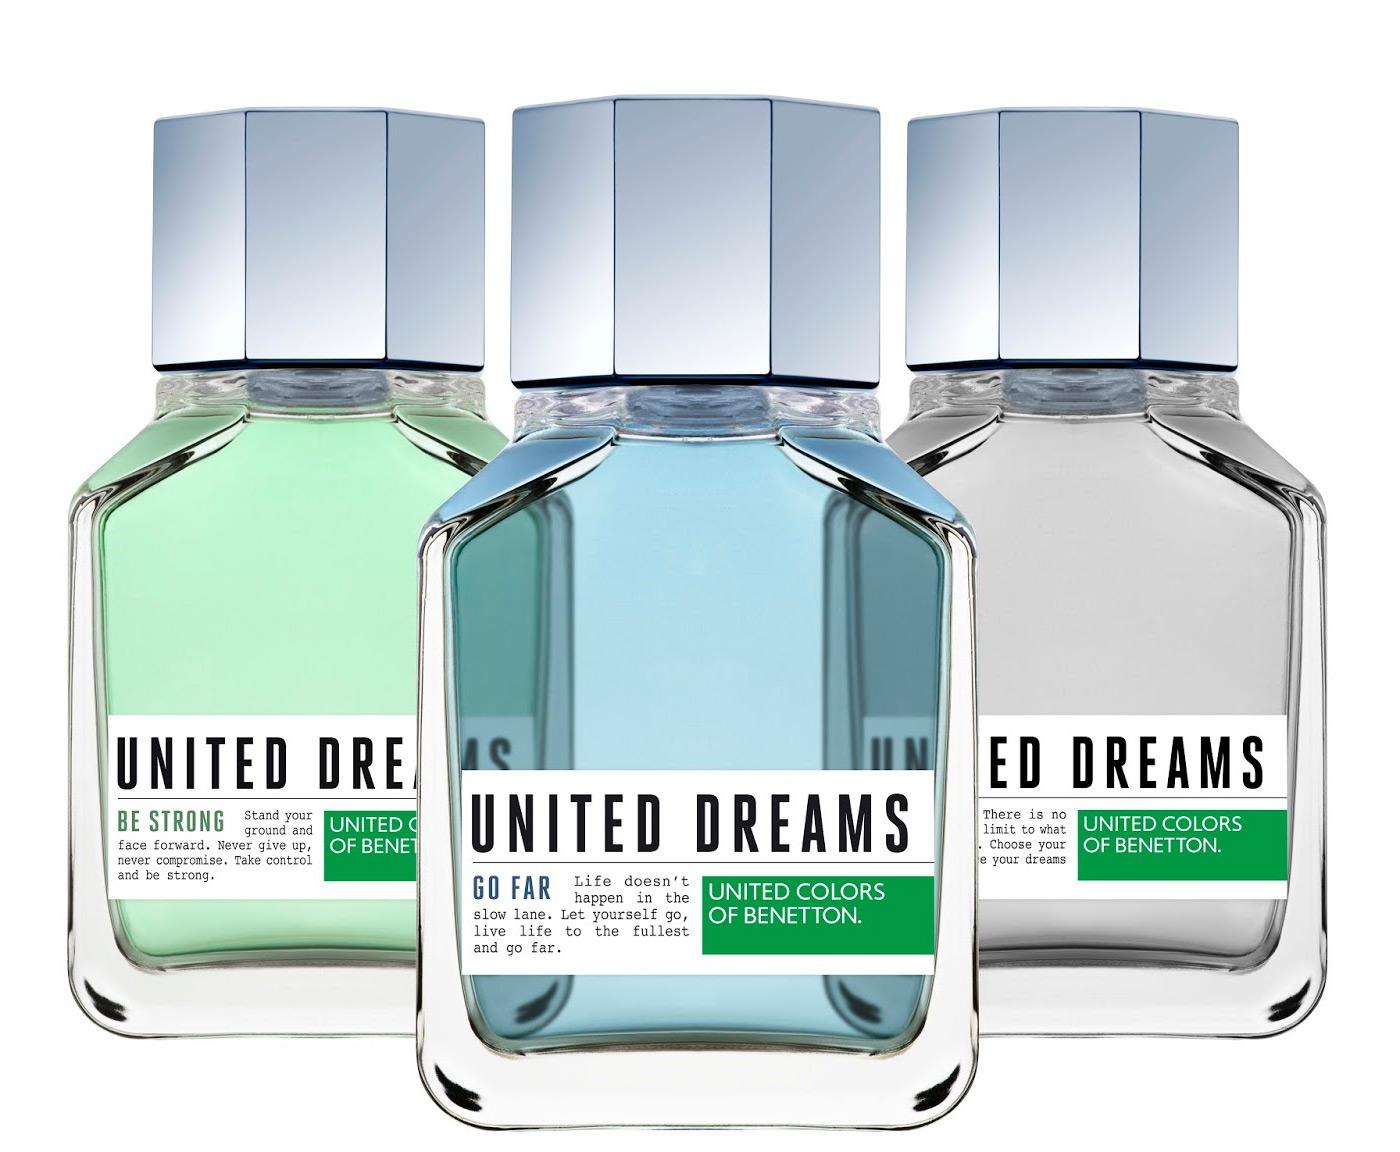 United Dreams Men Aim High Benetton Cologne A Fragrance For 2015 B Jeans Edt Man Parfum 100ml 100 Original Pictures